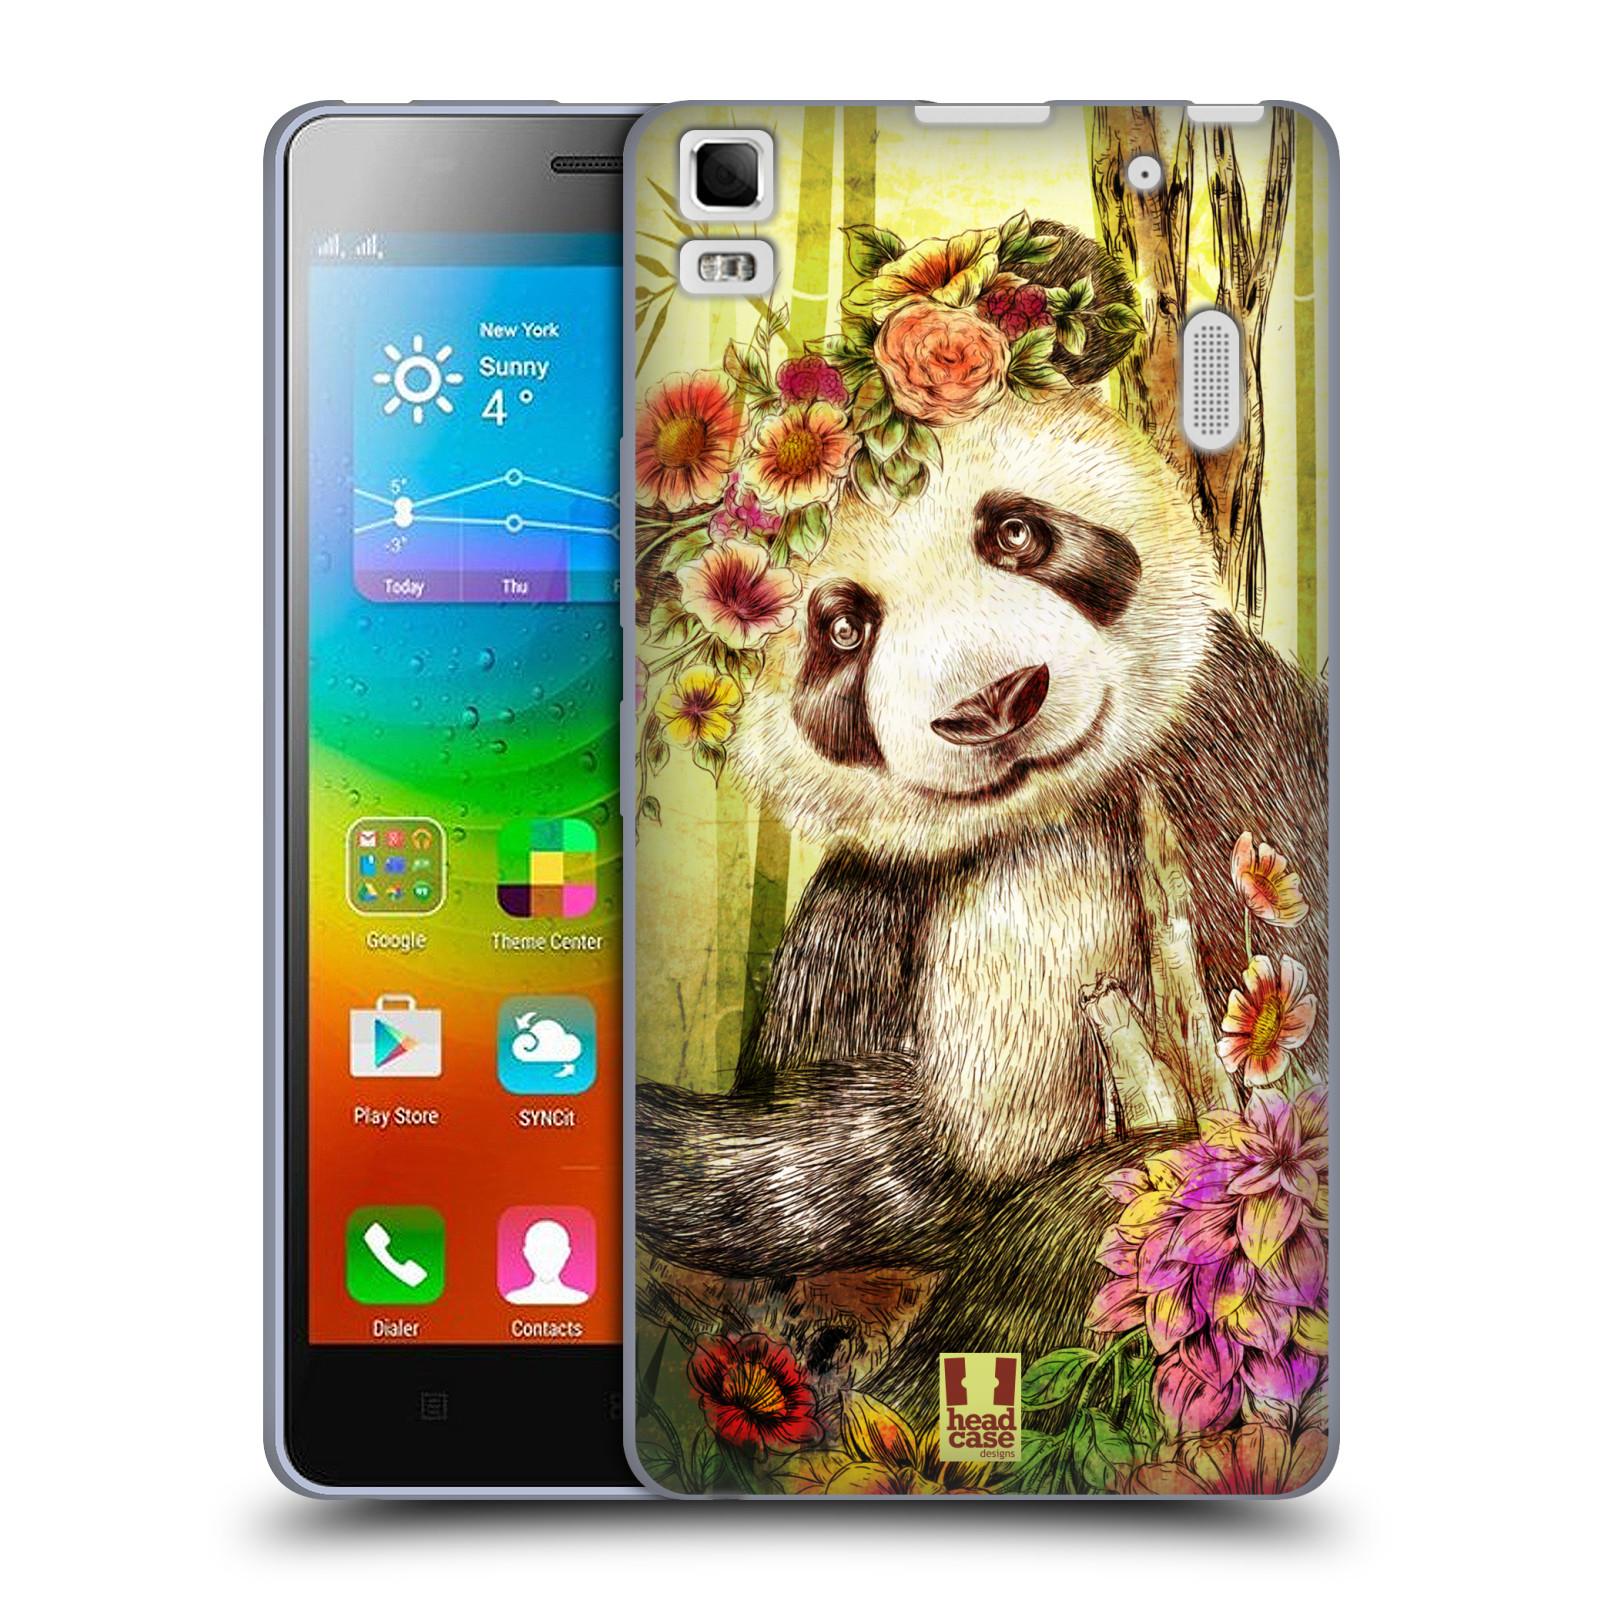 HEAD CASE silikonový obal na mobil Lenovo A7000 / A7000 DUAL / K3 Note vzor Květinová zvířáta MEDVÍDEK PANDA